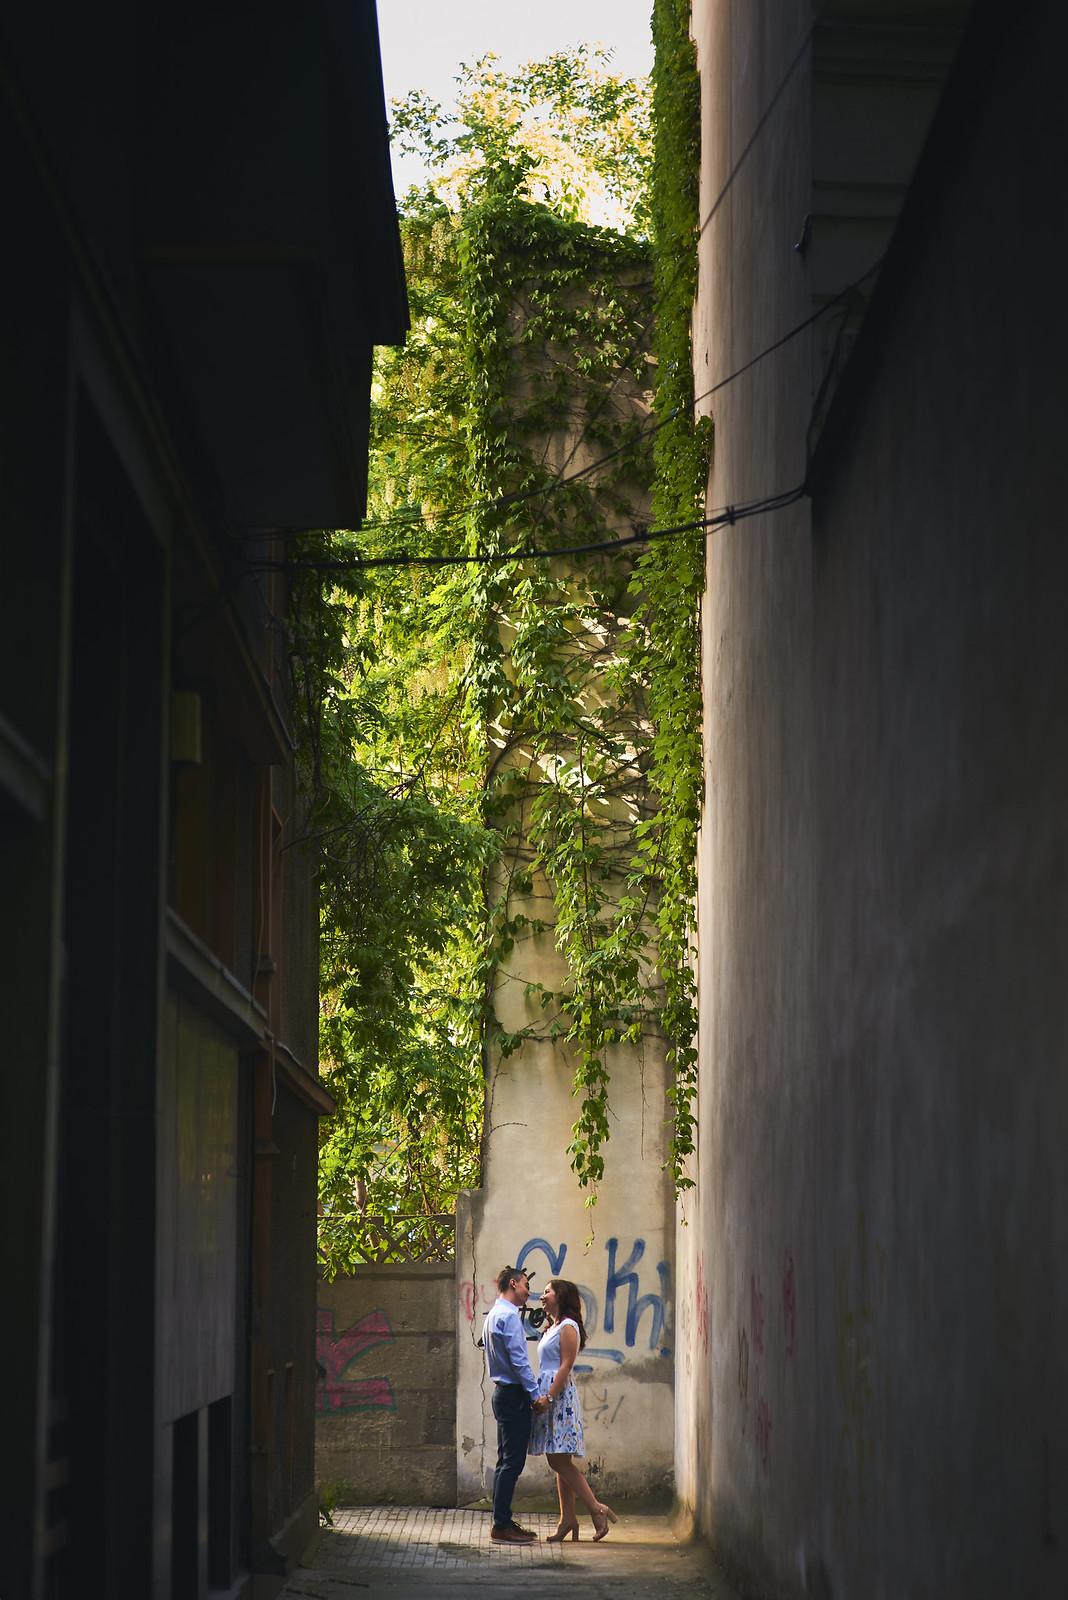 photo session, epspictures, Endless Purple Skies Pictures, fotografie, eveniment, sedinta foto ,fine art photography, fineart, candid, emotional, artistic, documentary, images, photo, photos, romania, bucharest, bucuresti